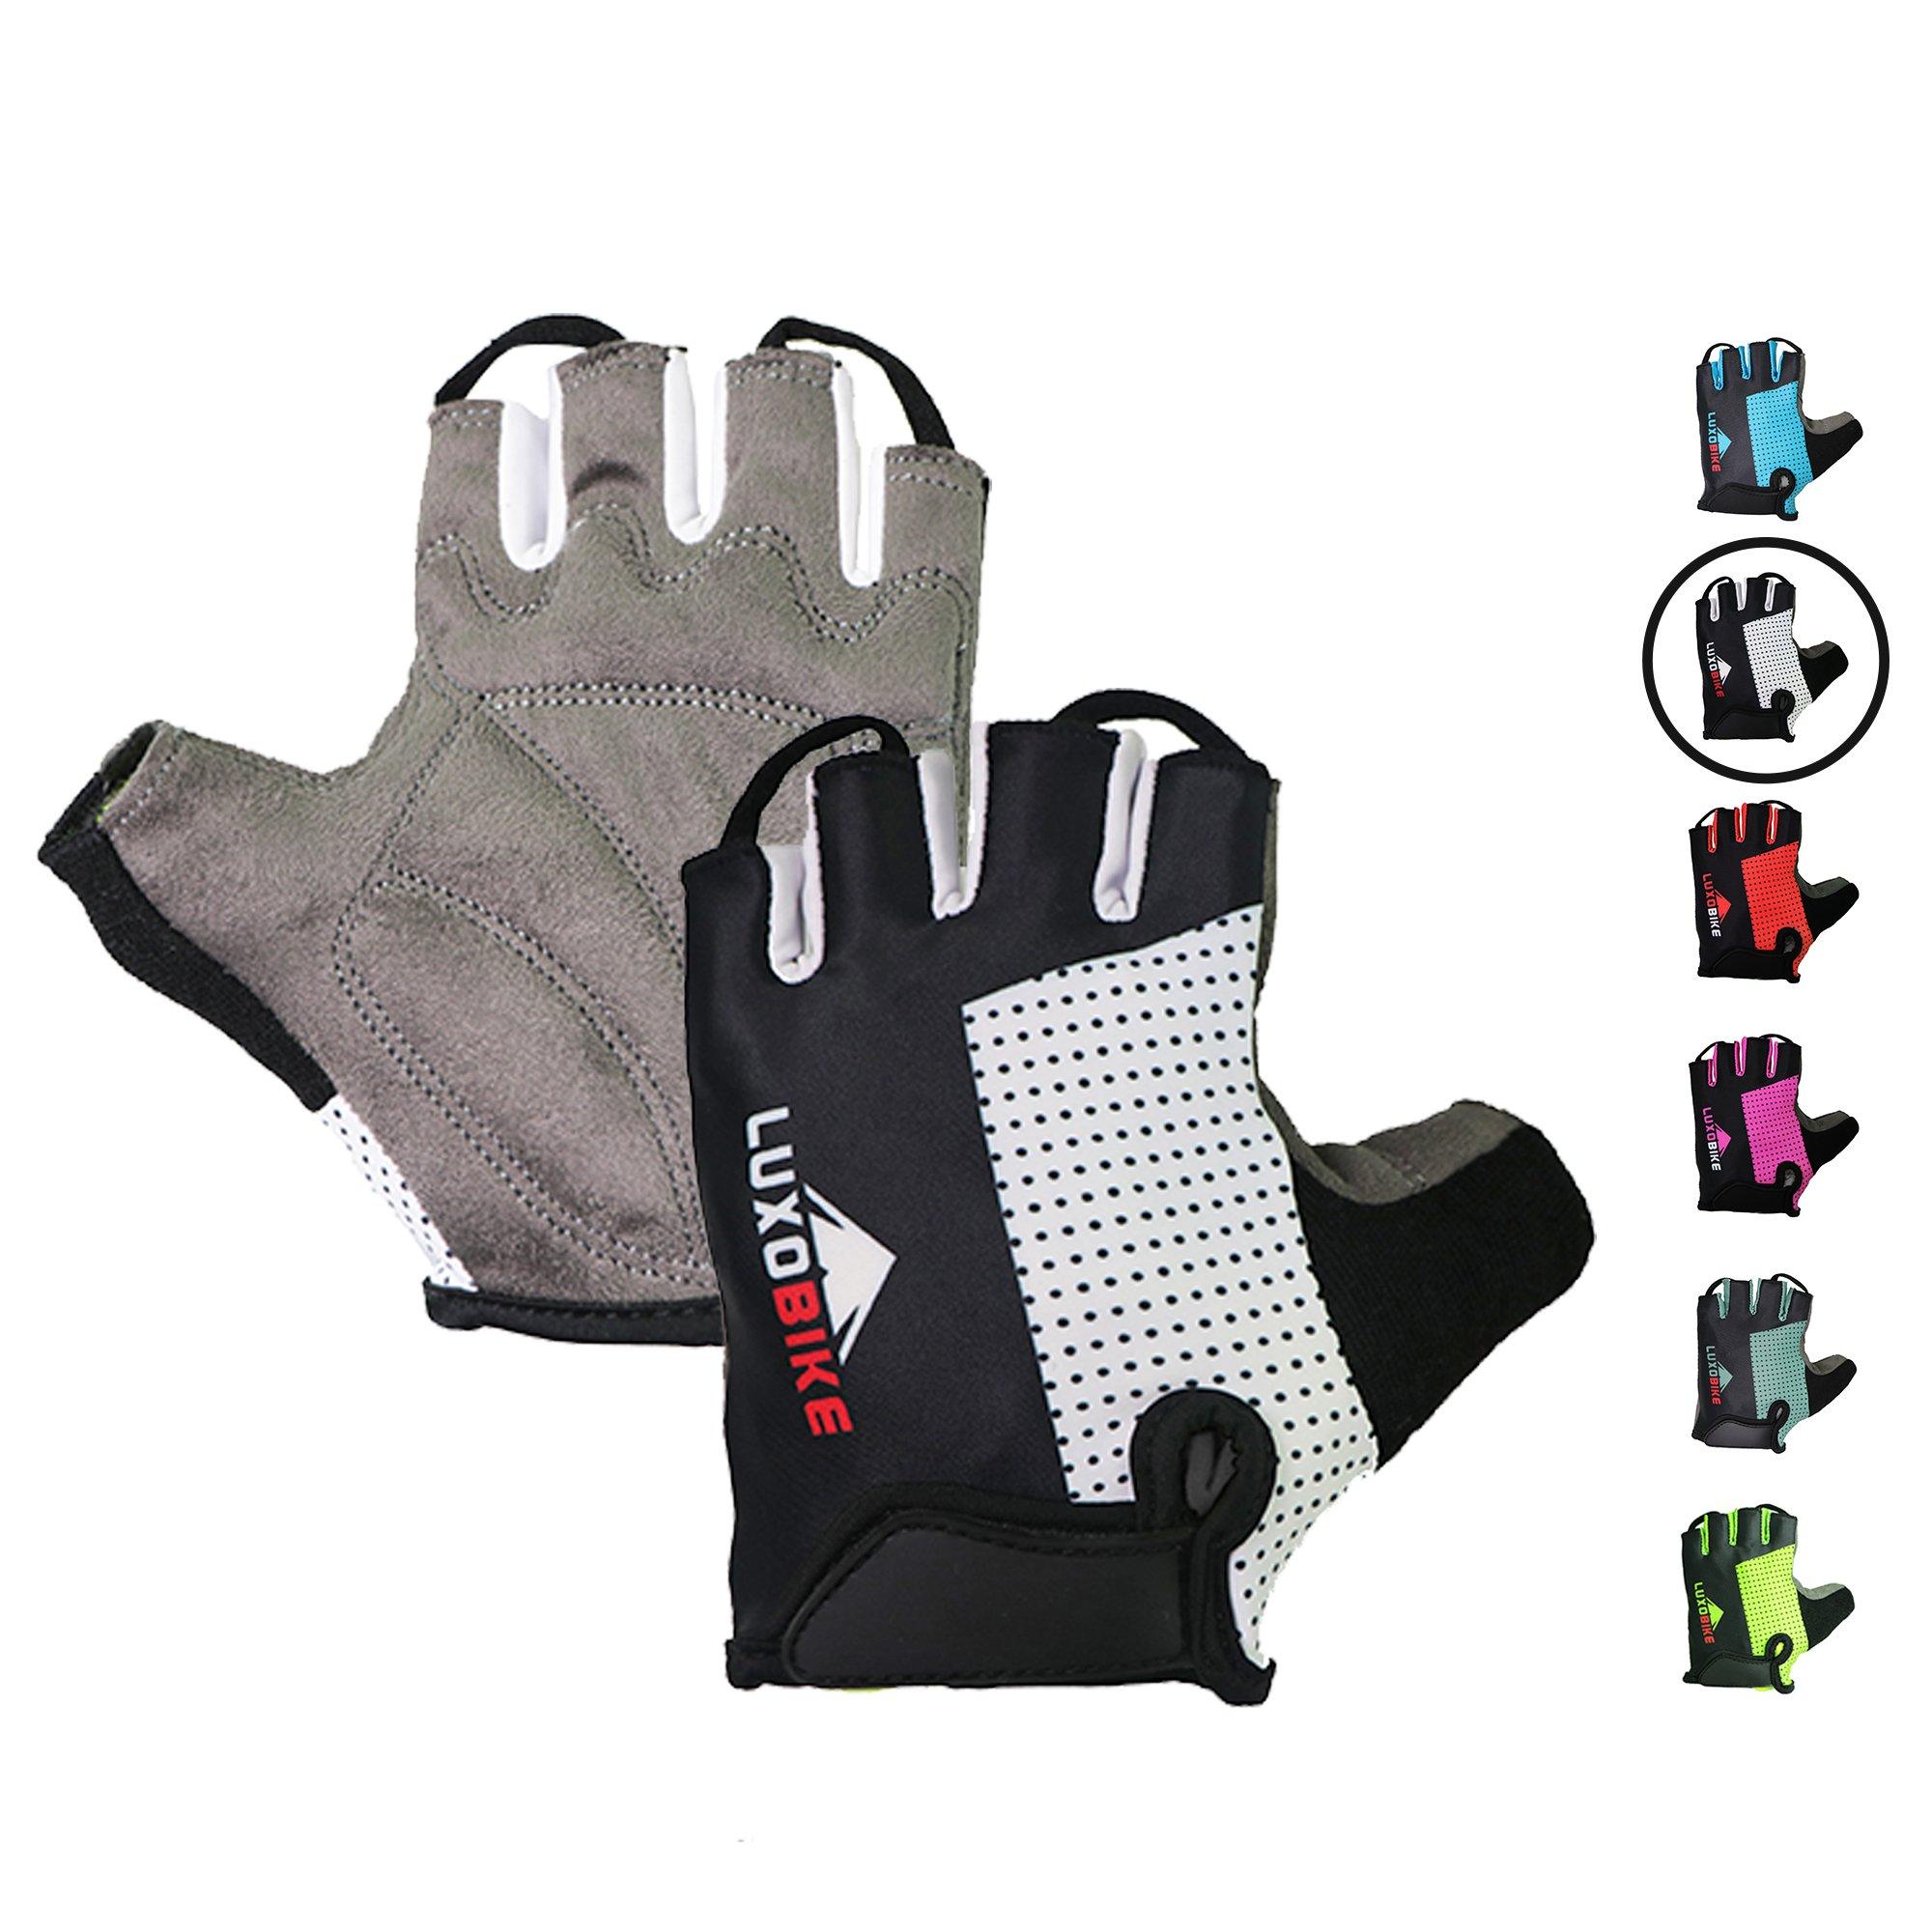 Practical 2019 Outdoor Driver Gloves Half Finger Anti Slip Gel Pad Motorcycle Working Gloves Men Women Racing Gloves Mail & Shipping Supplies